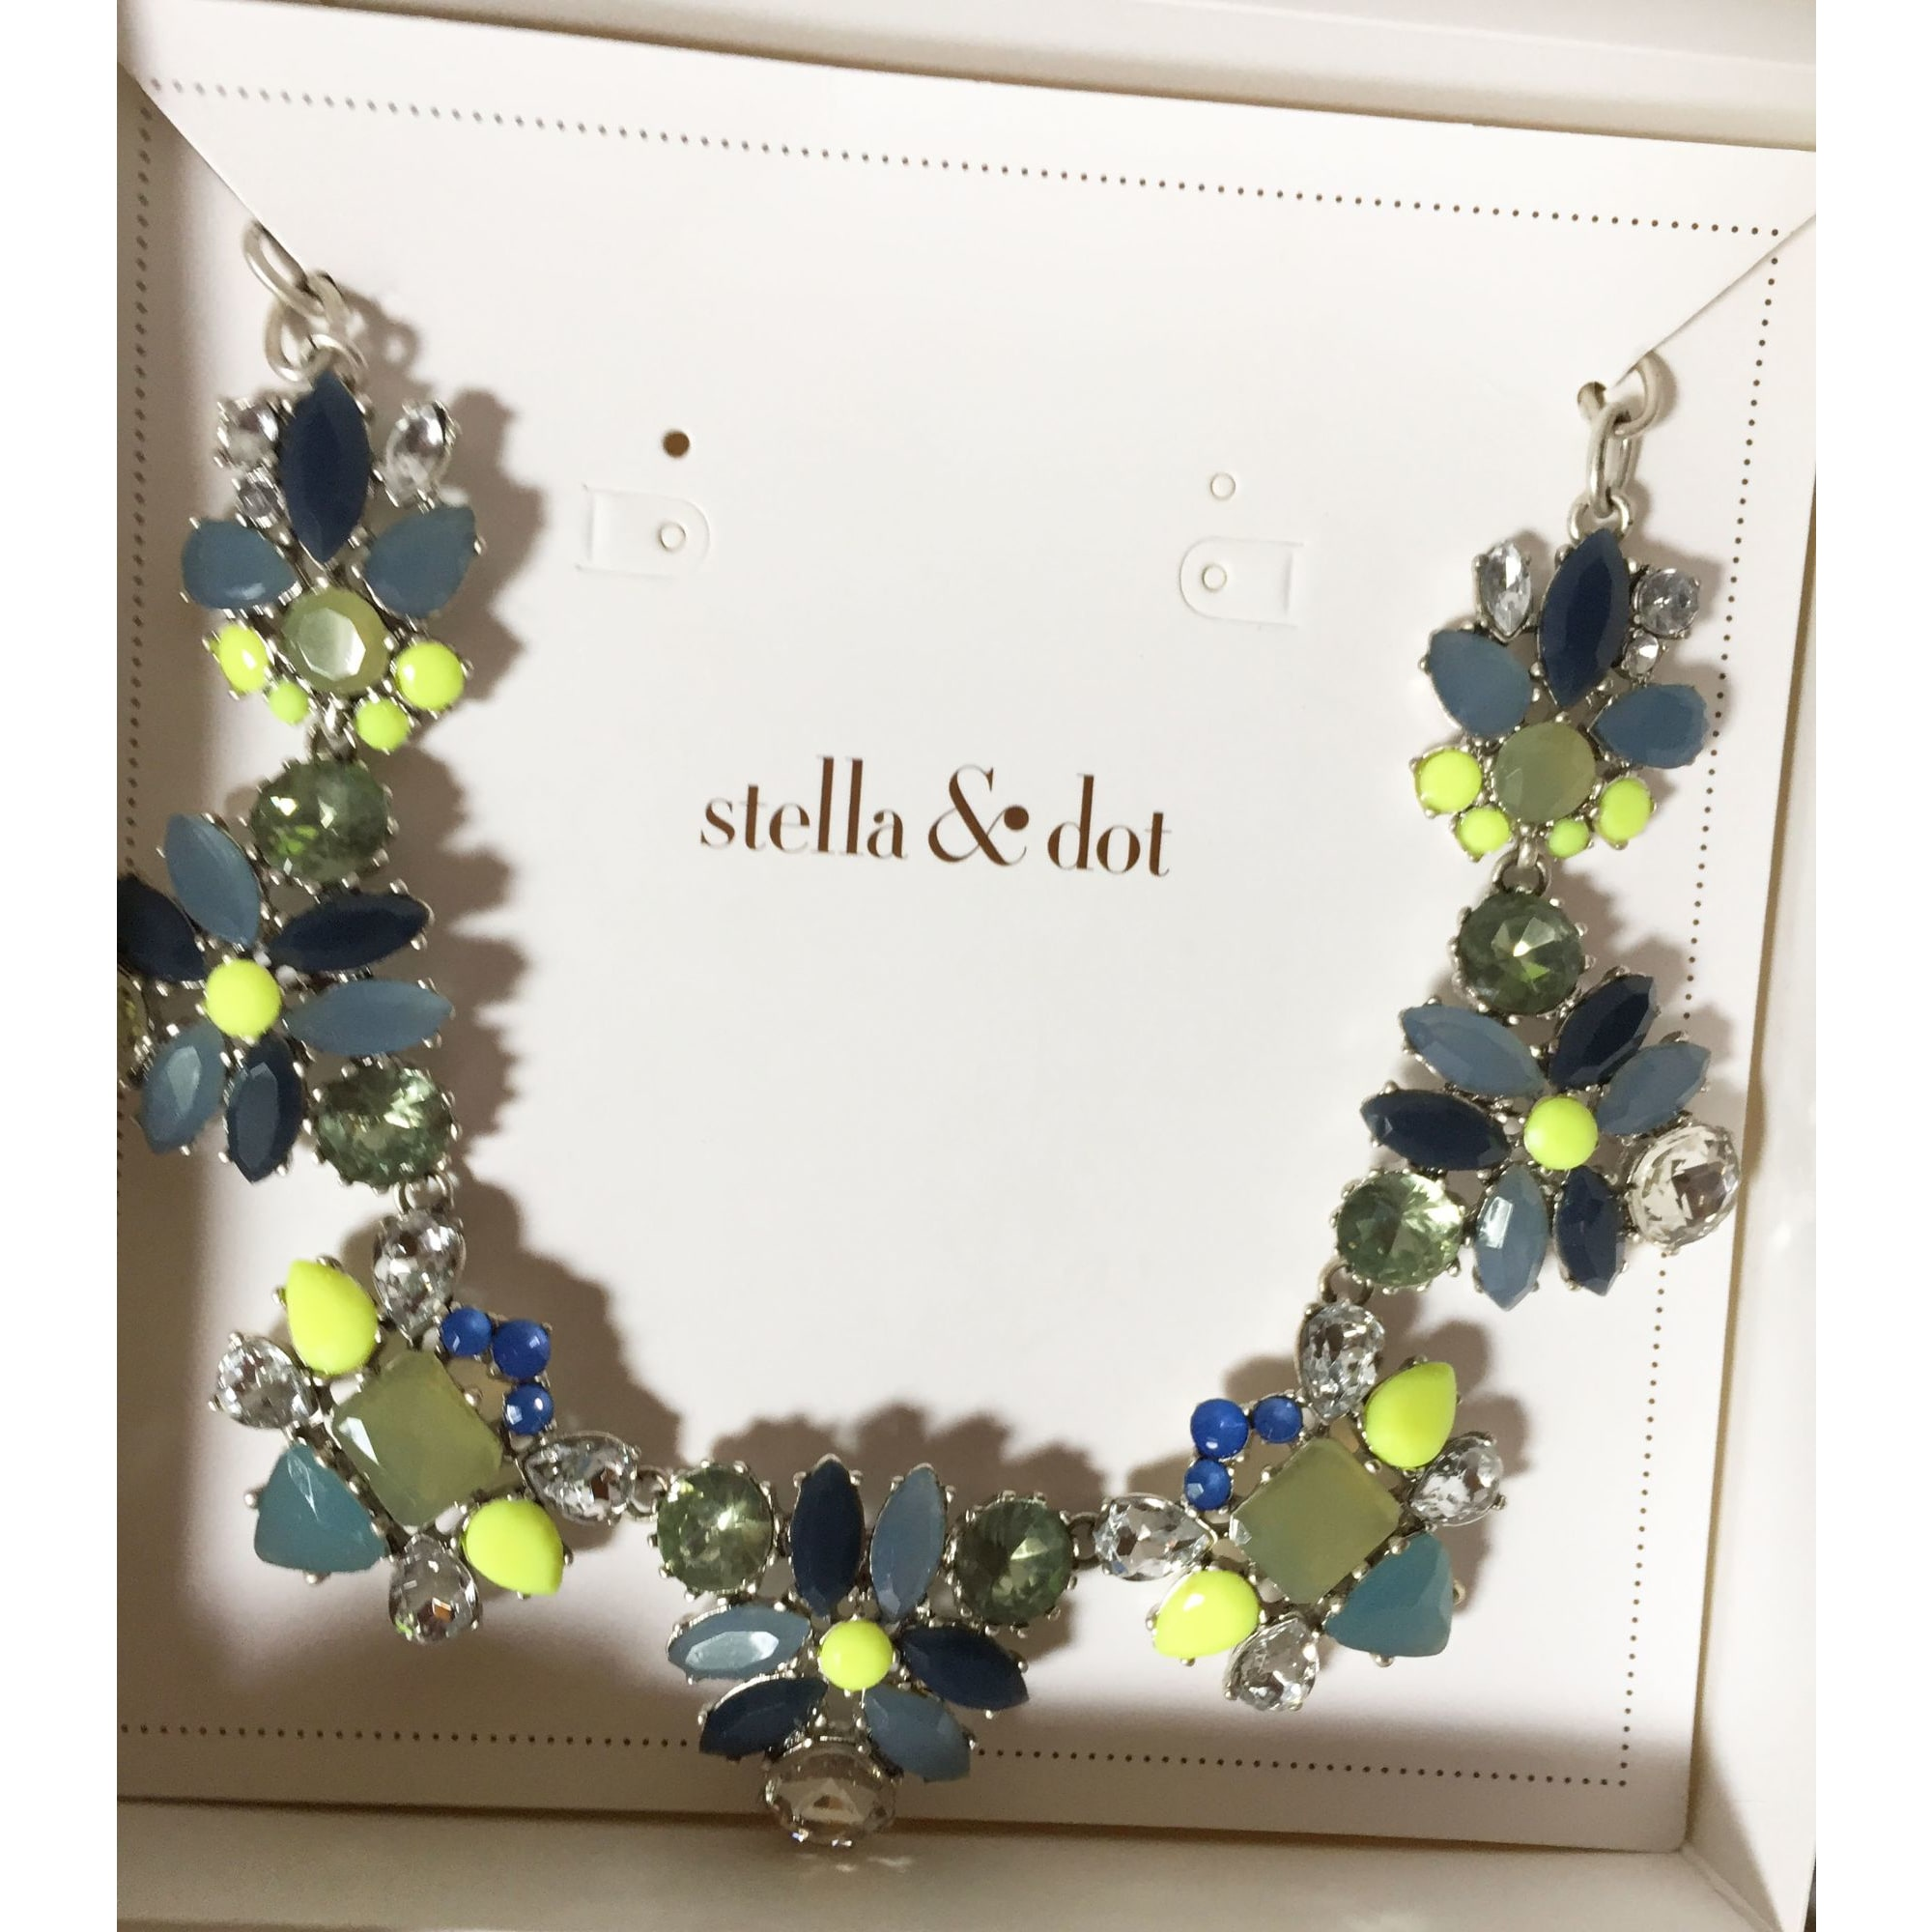 Pendentif, collier pendentif STELLA & DOT Bleu, bleu marine, bleu turquoise